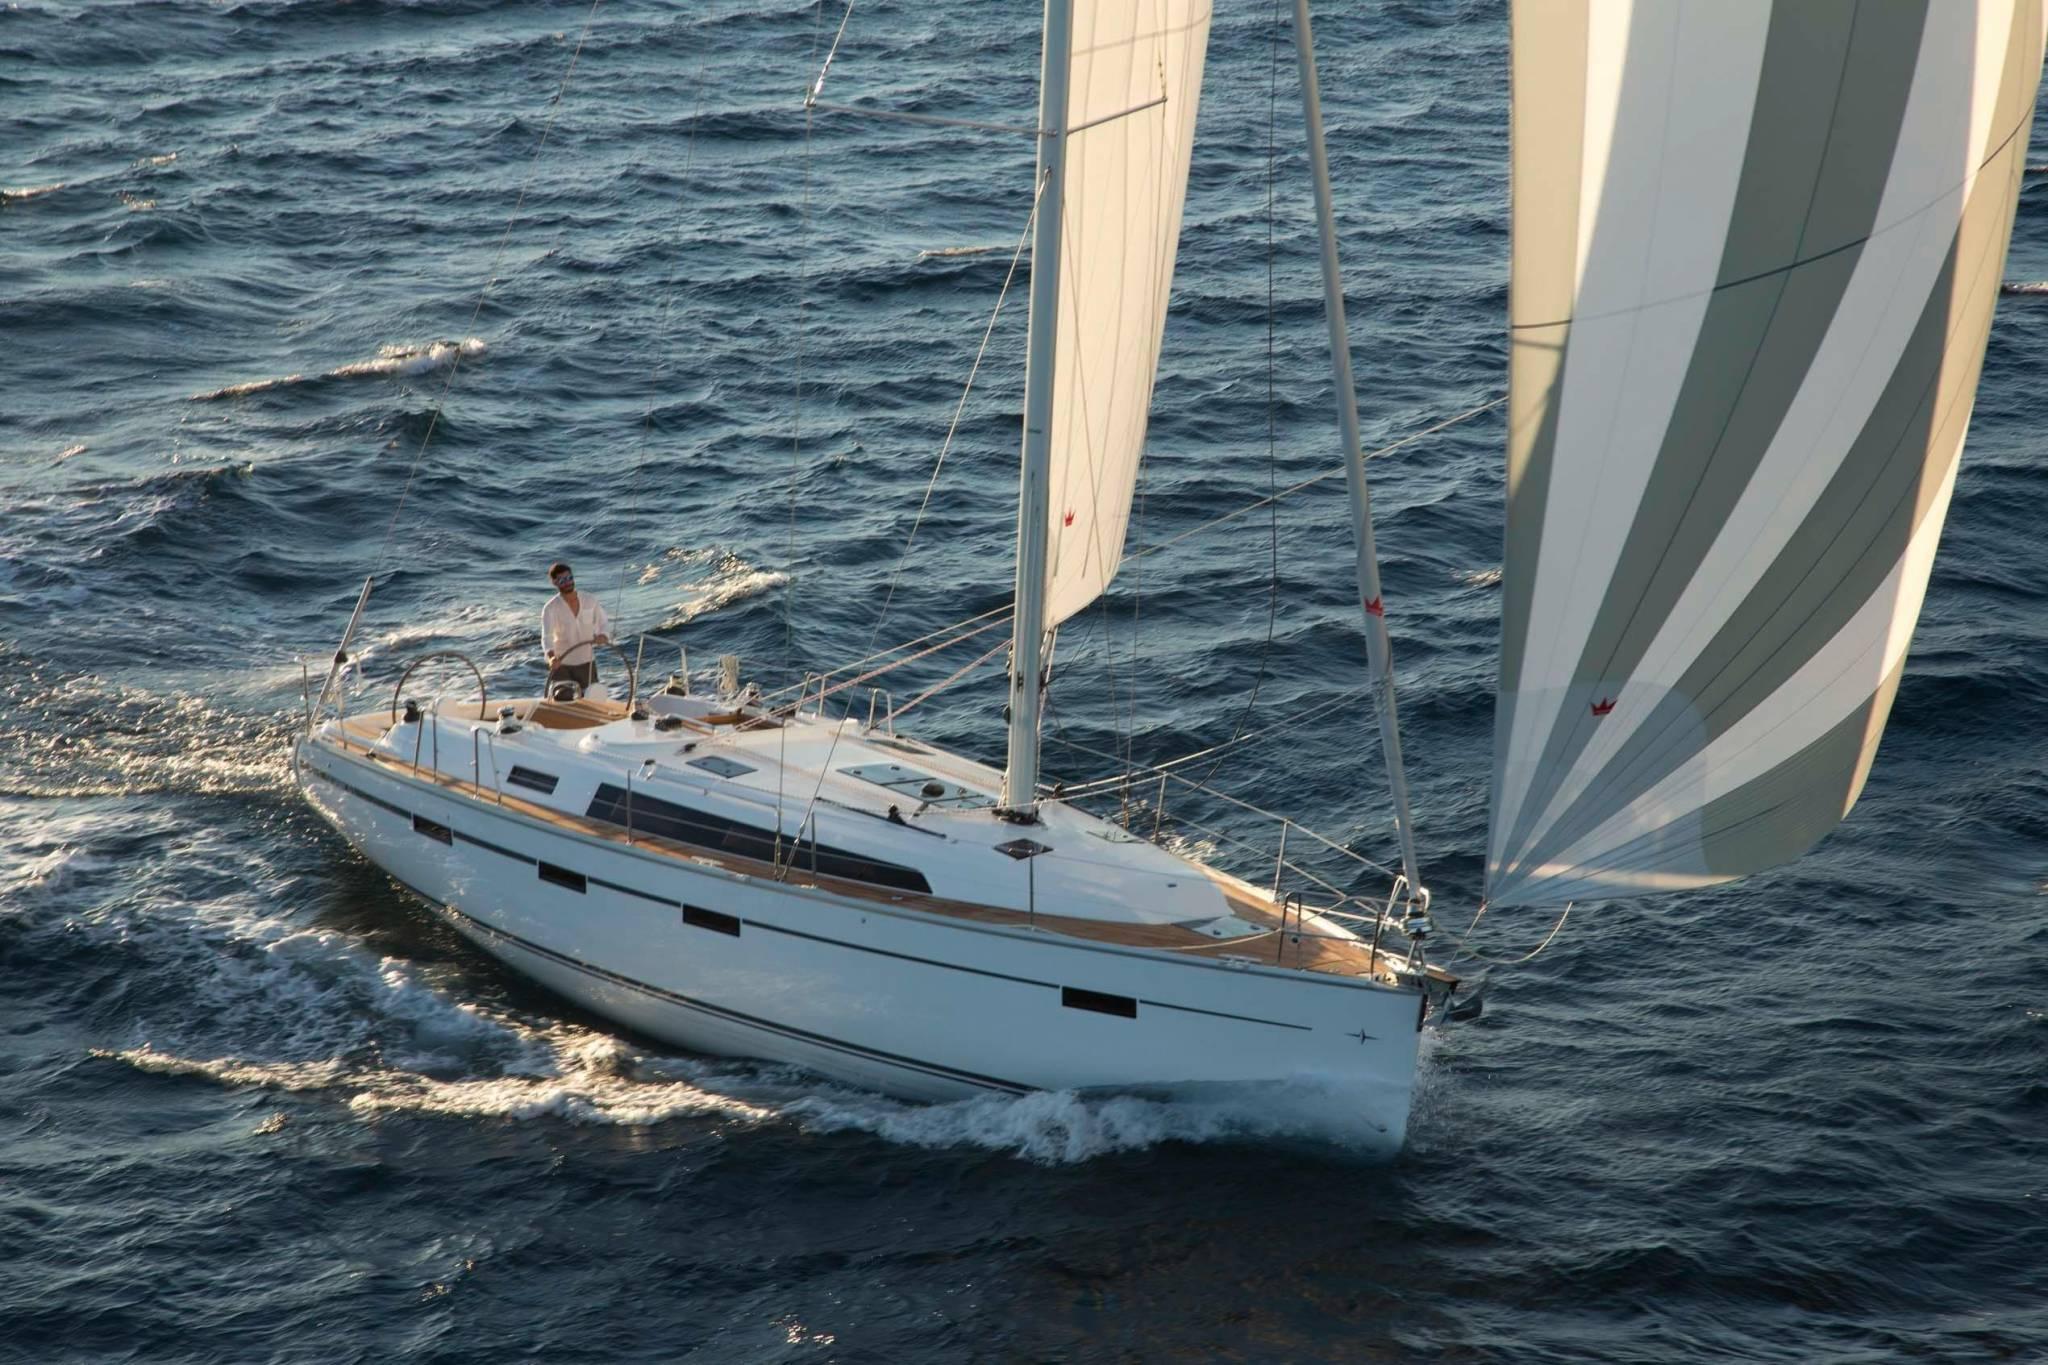 Bavaria 41 Cruiser sailing